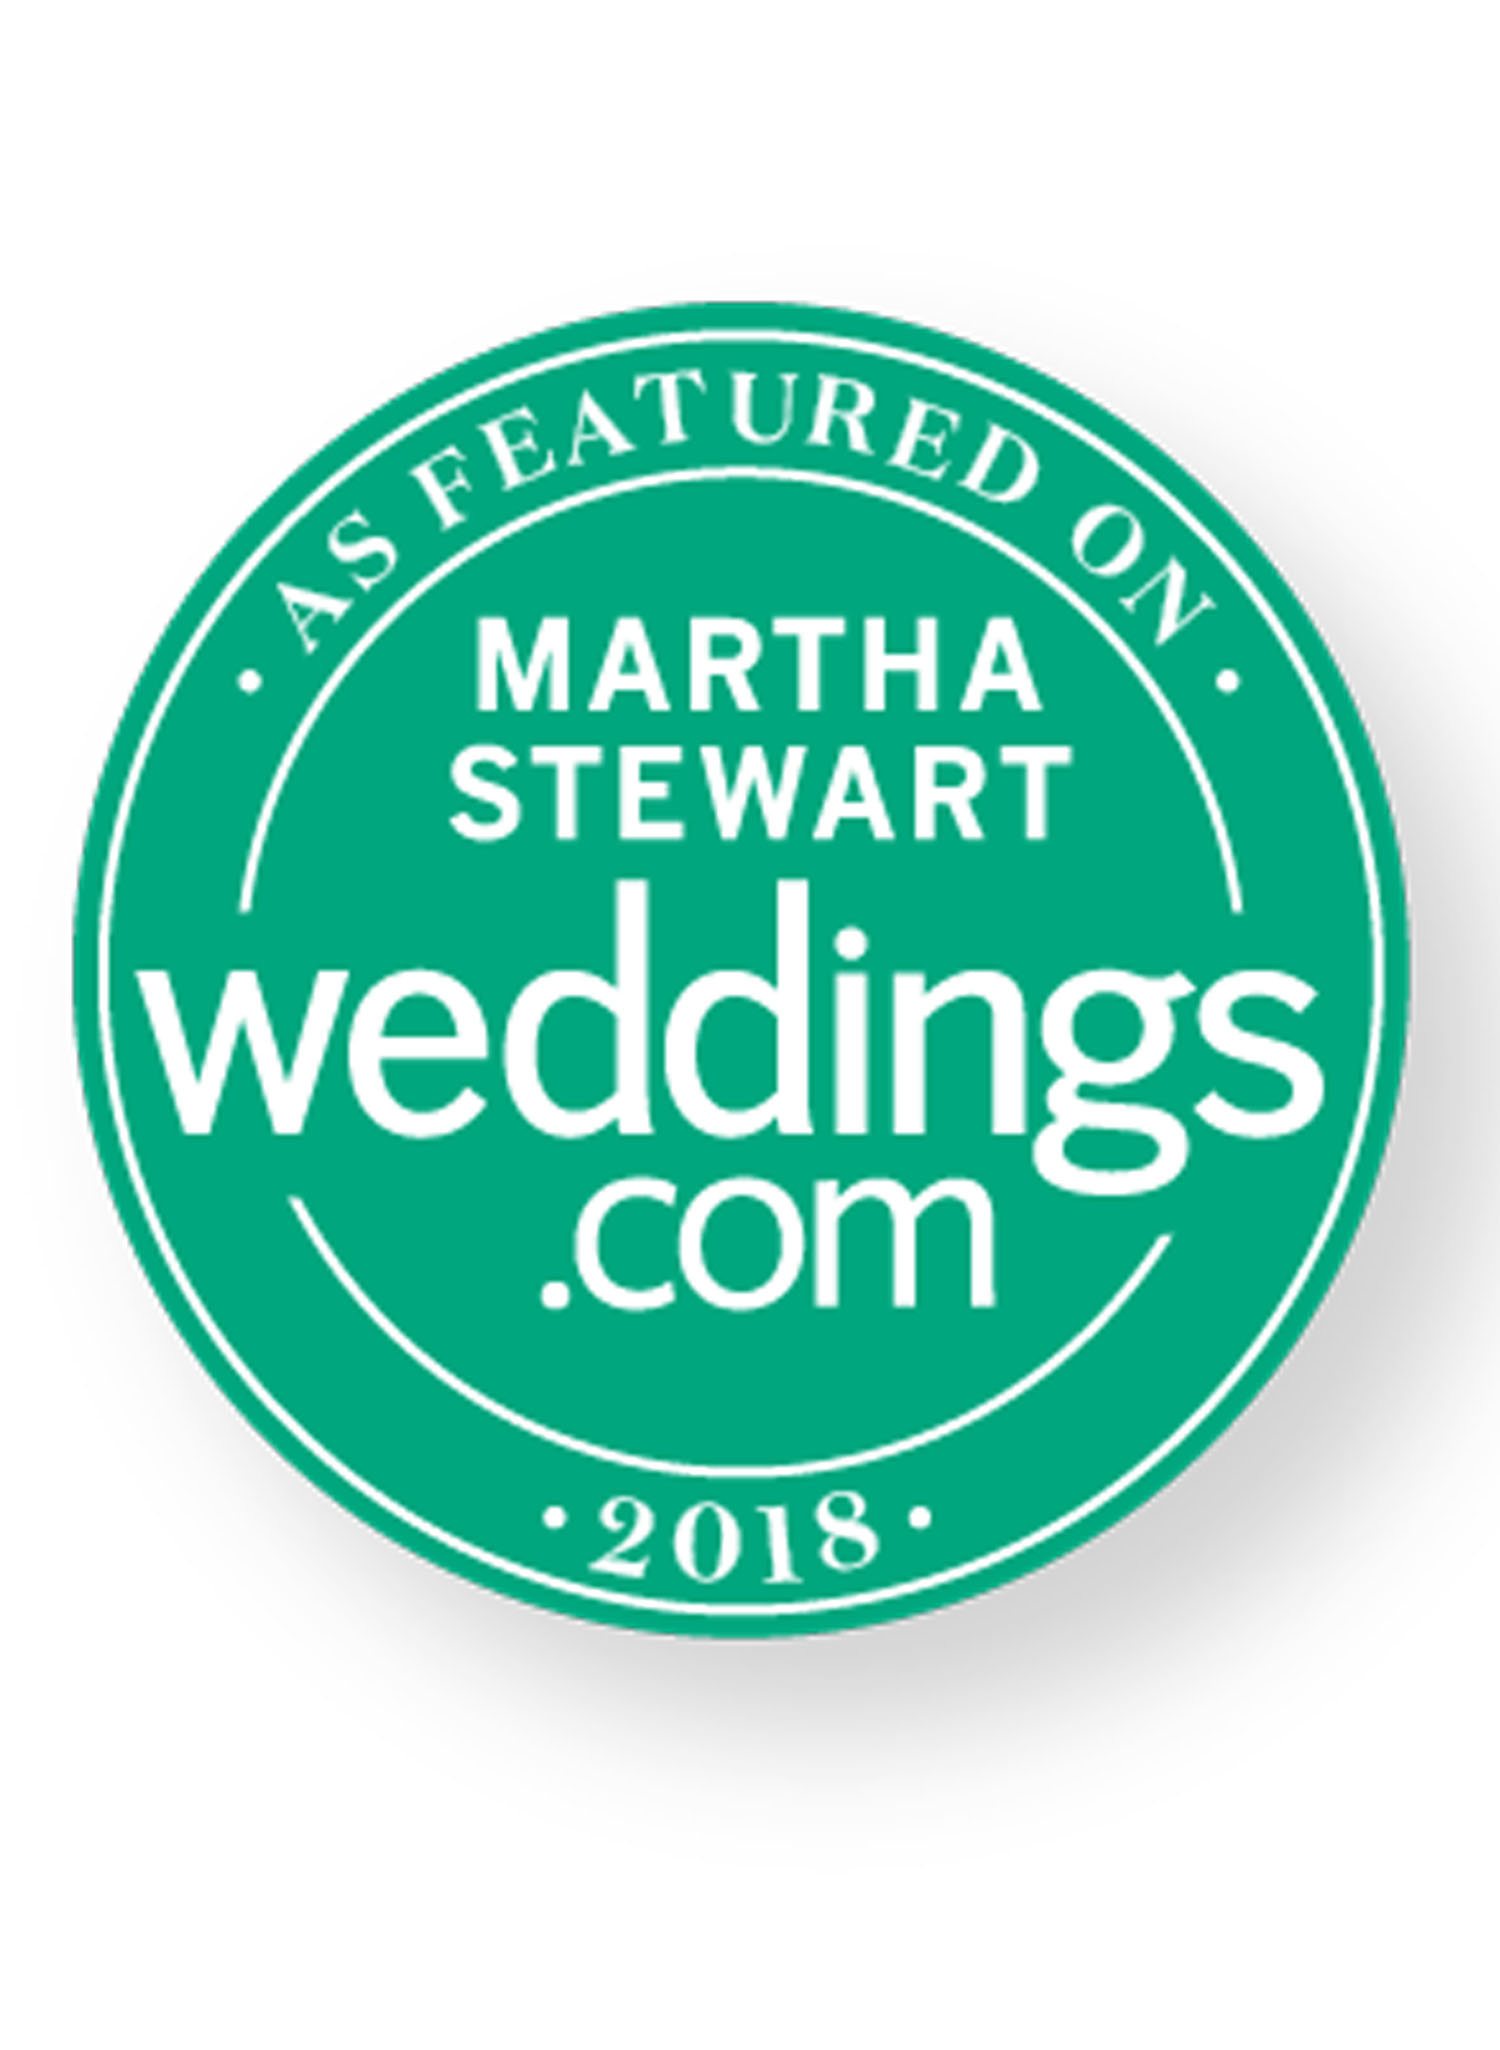 Martha Stewart Badge.jpg